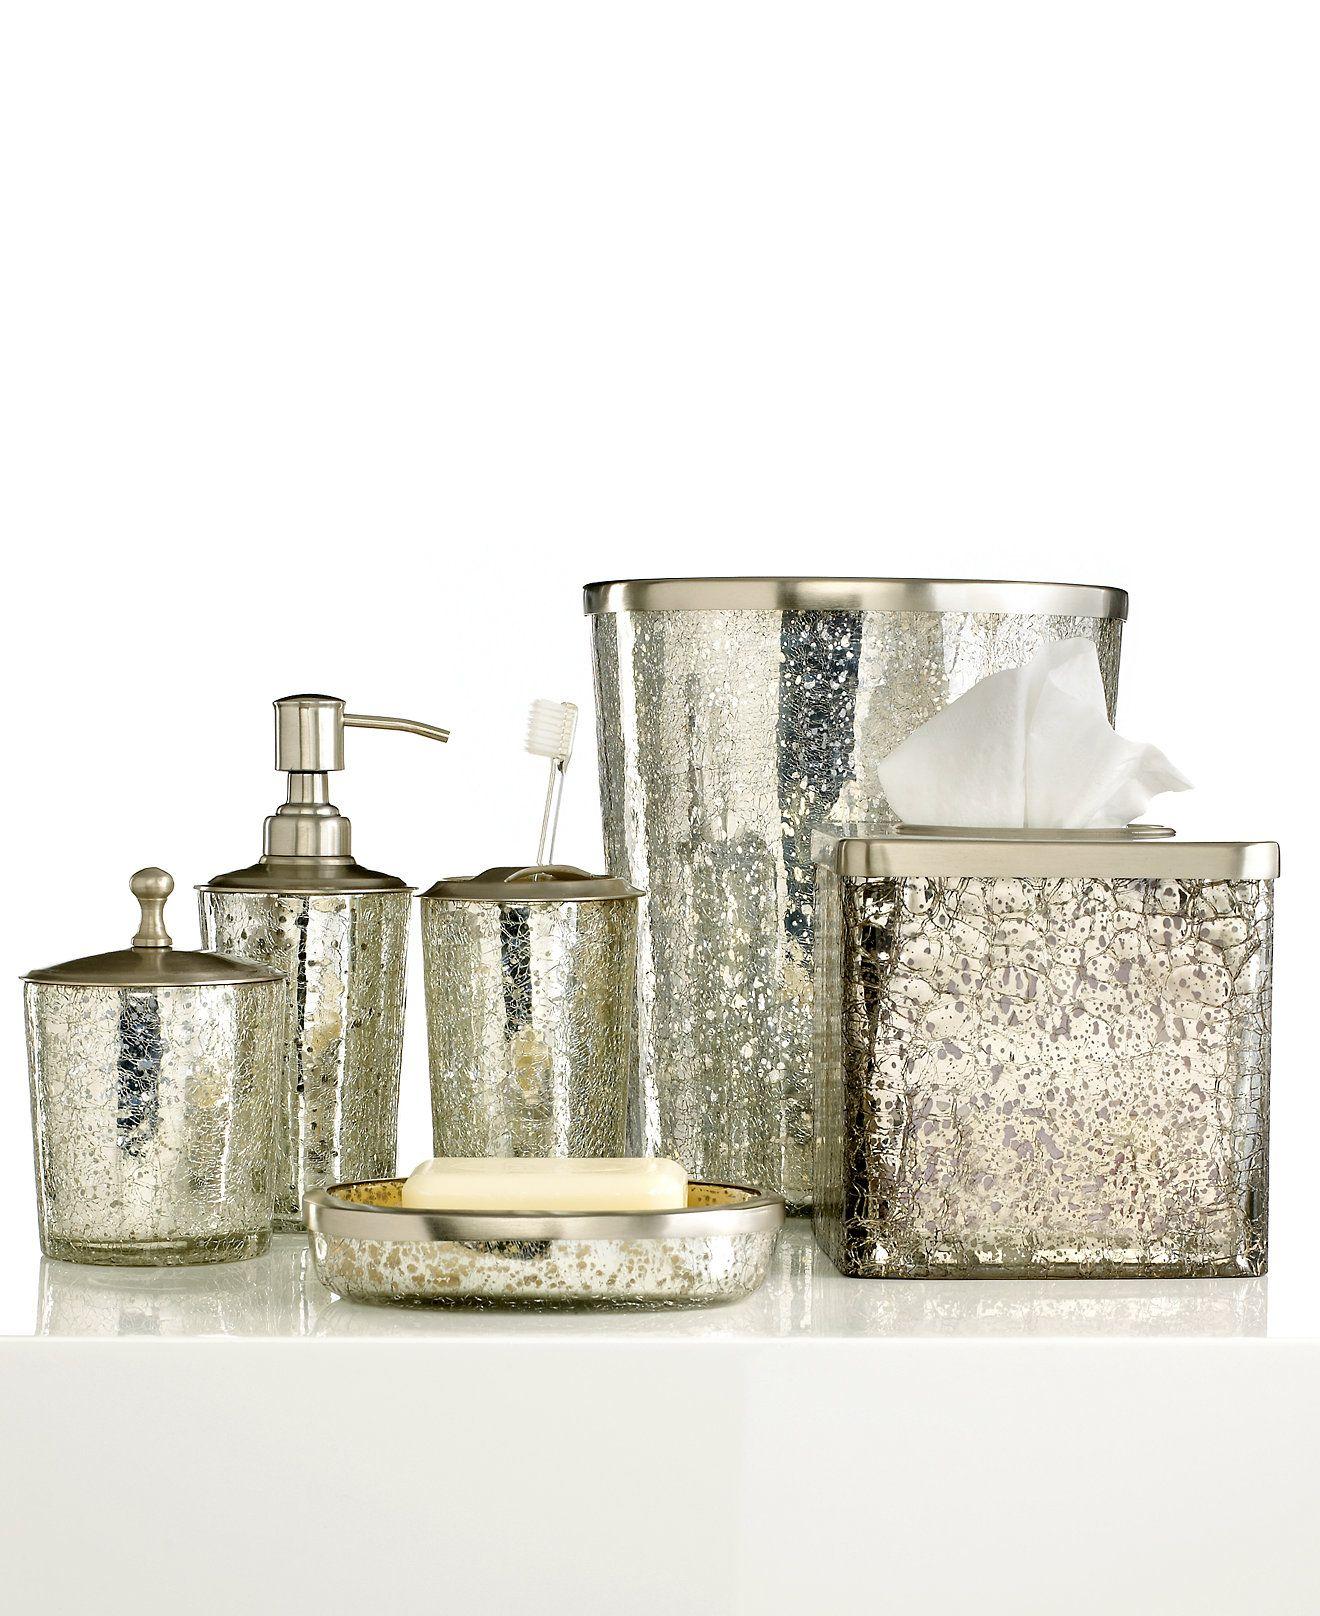 mercury glass bathroom accessories. Paradigm Bath Accessories, Crackle Glass Ice Collection - Bathroom Accessories Bed \u0026 Mercury